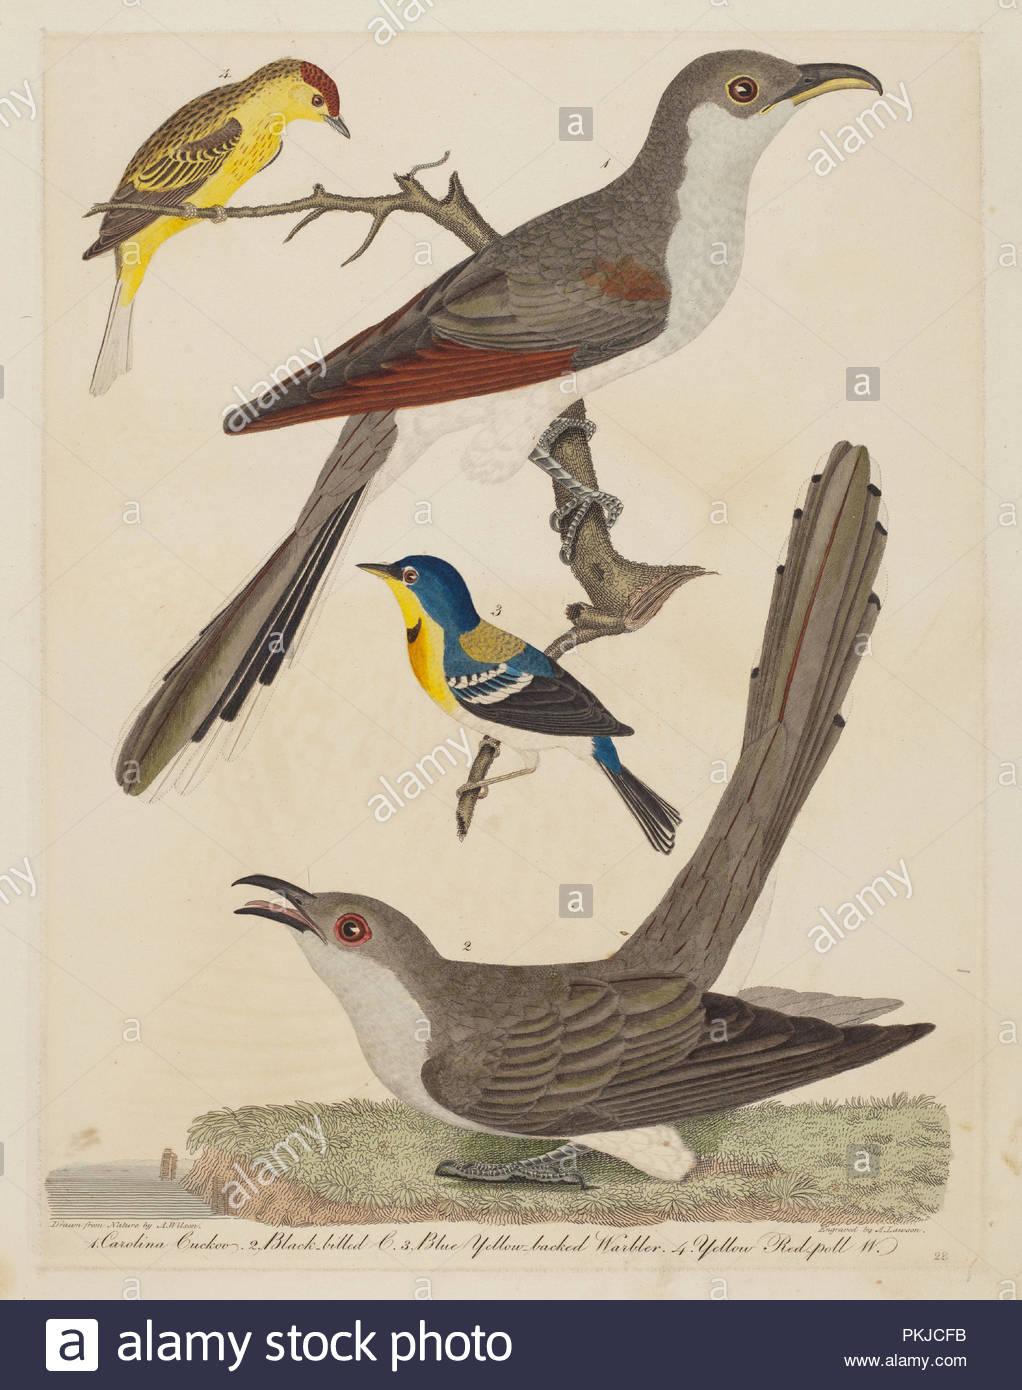 Carolina Cuckoo Black Billed Blue Yellow Backed Warbler And